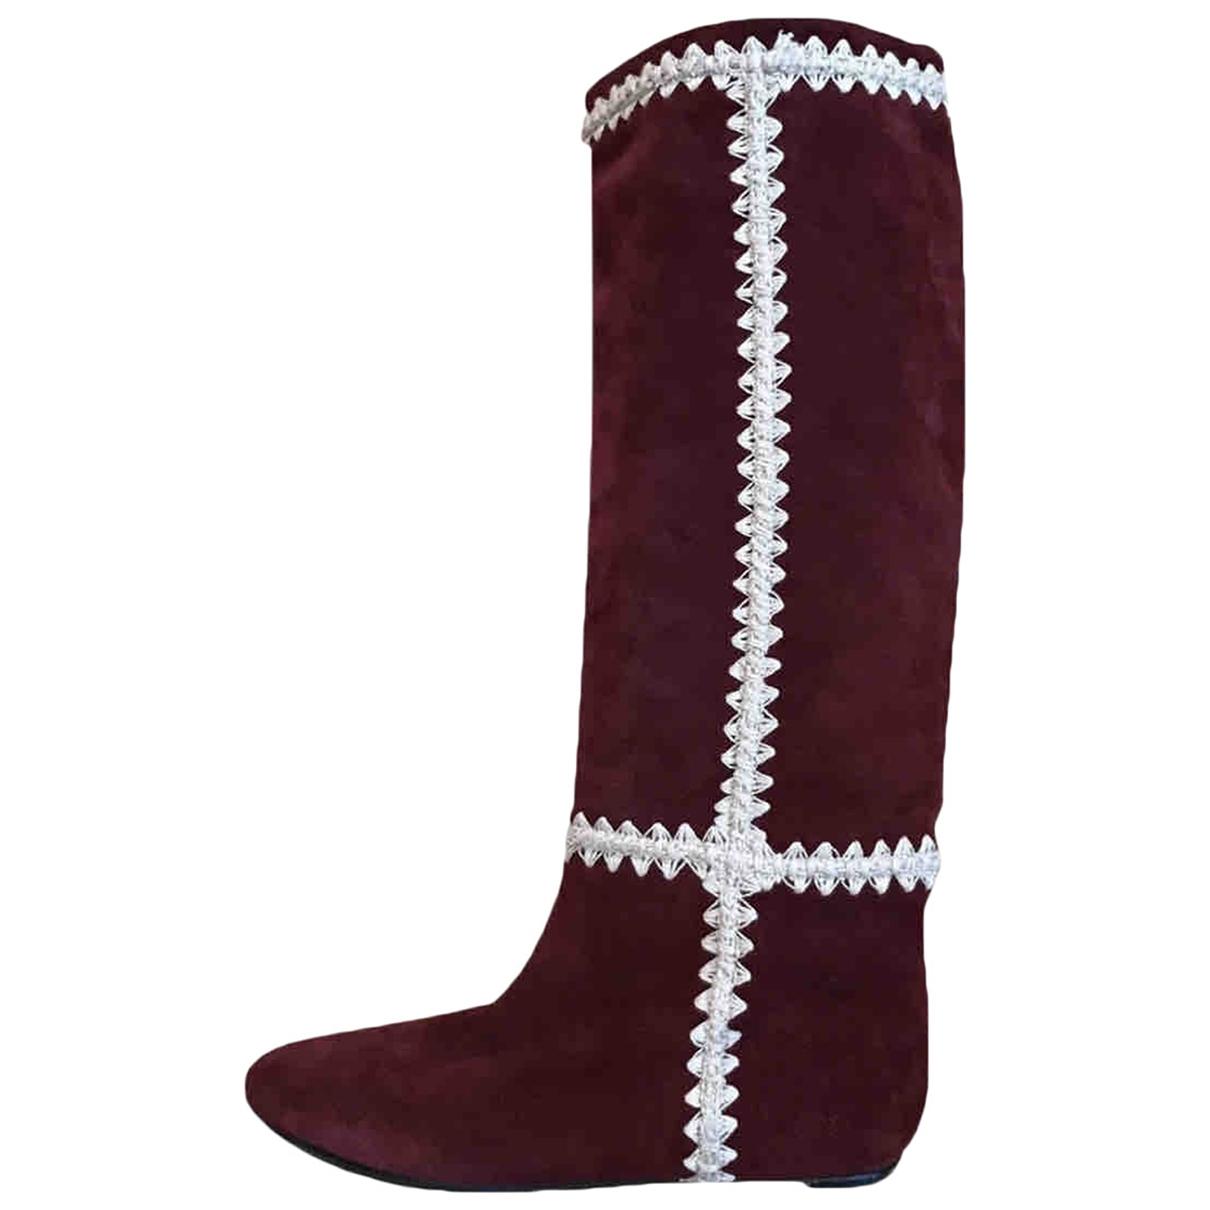 Casadei \N Burgundy Suede Boots for Women 36 EU